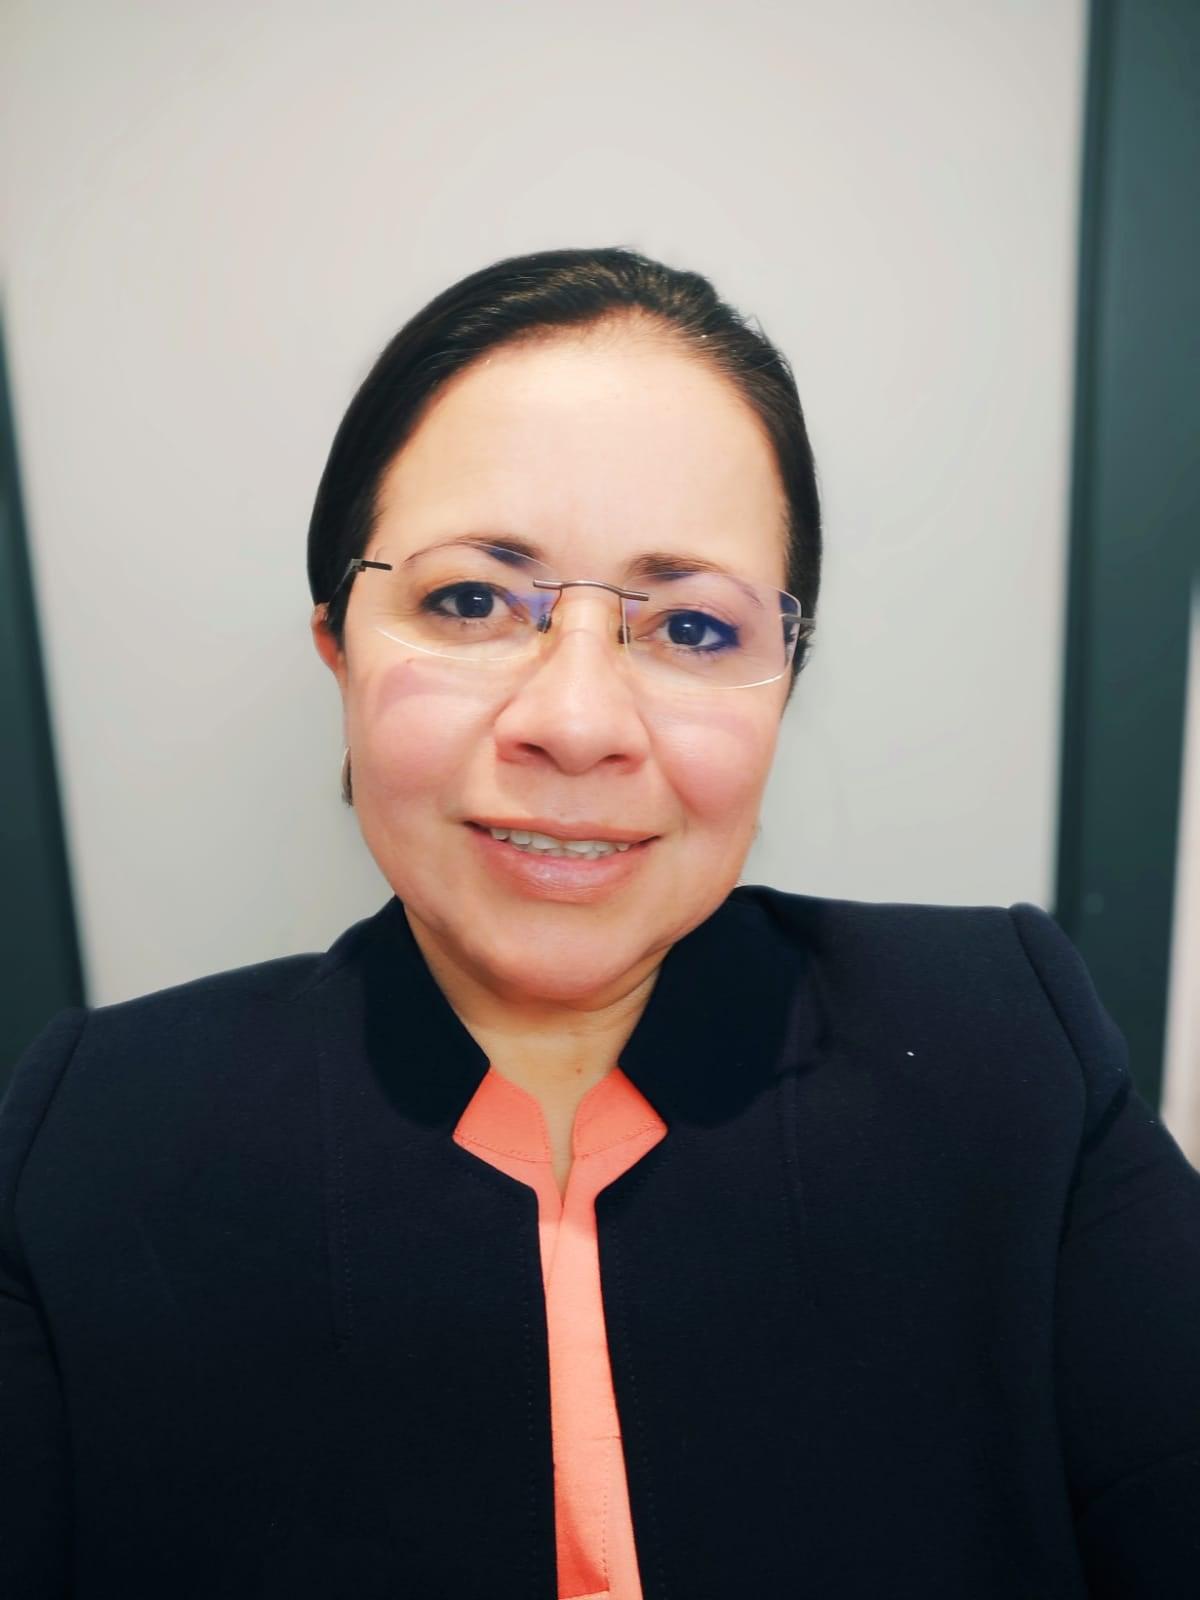 Ana Rodríguez Padilla